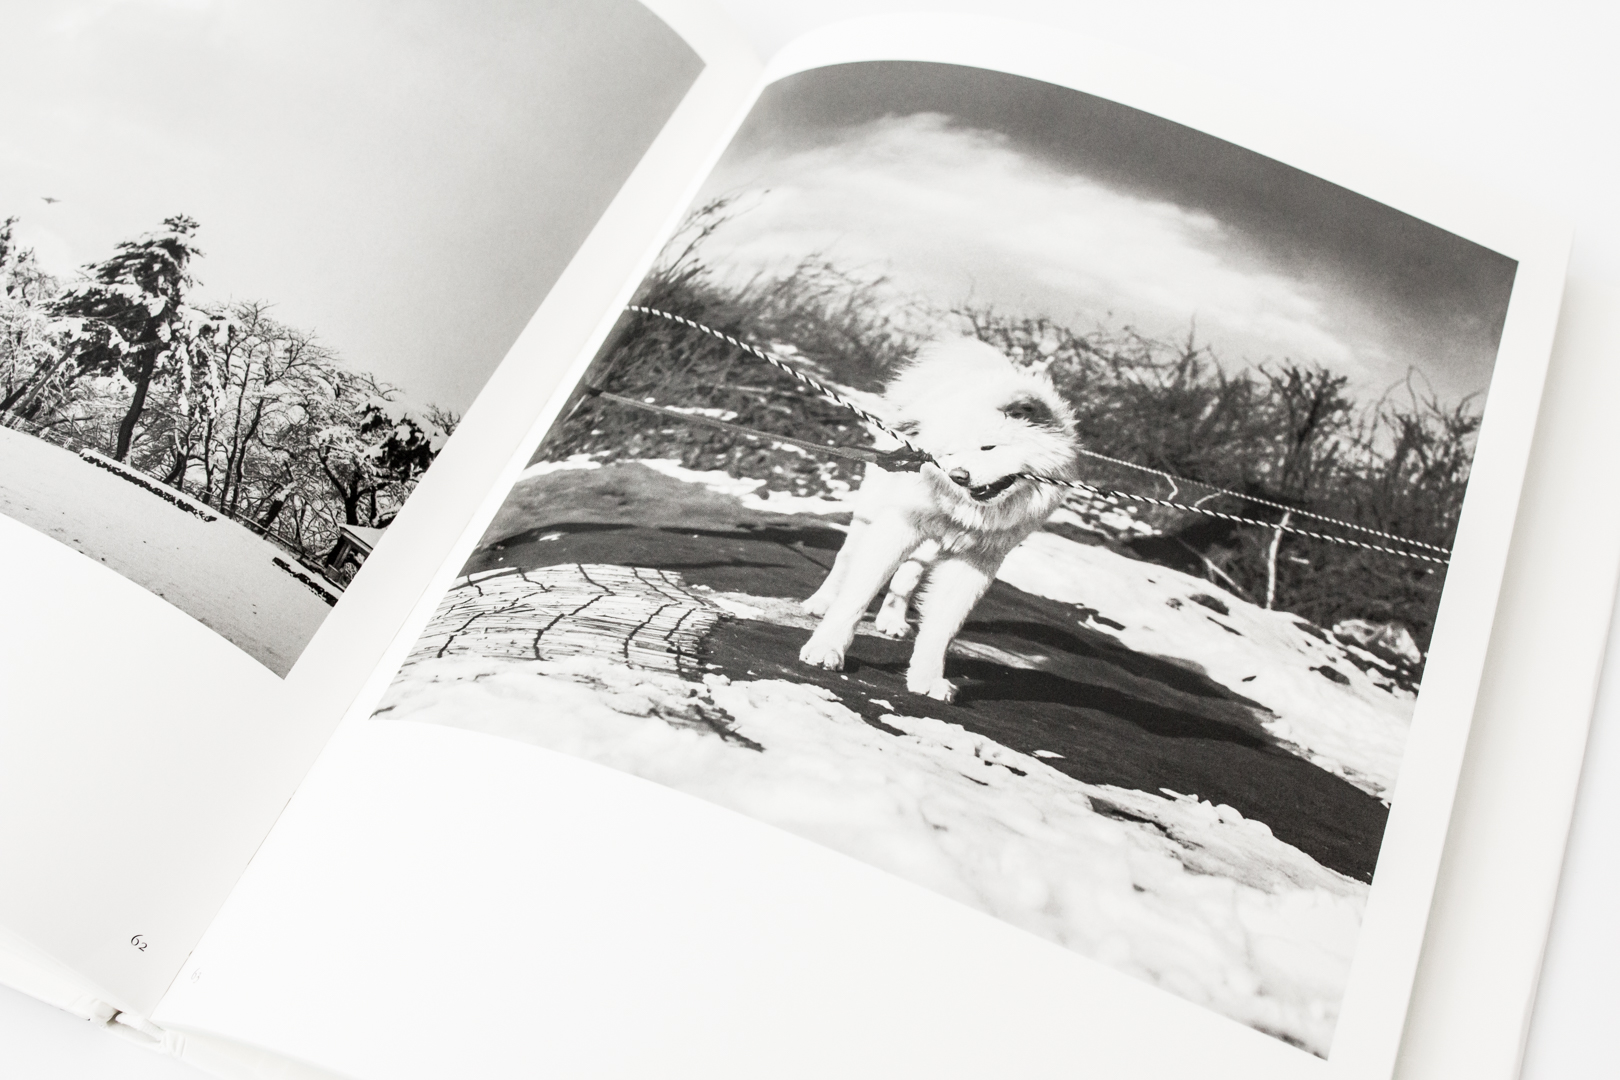 Tsugaru by Masako Tomiya